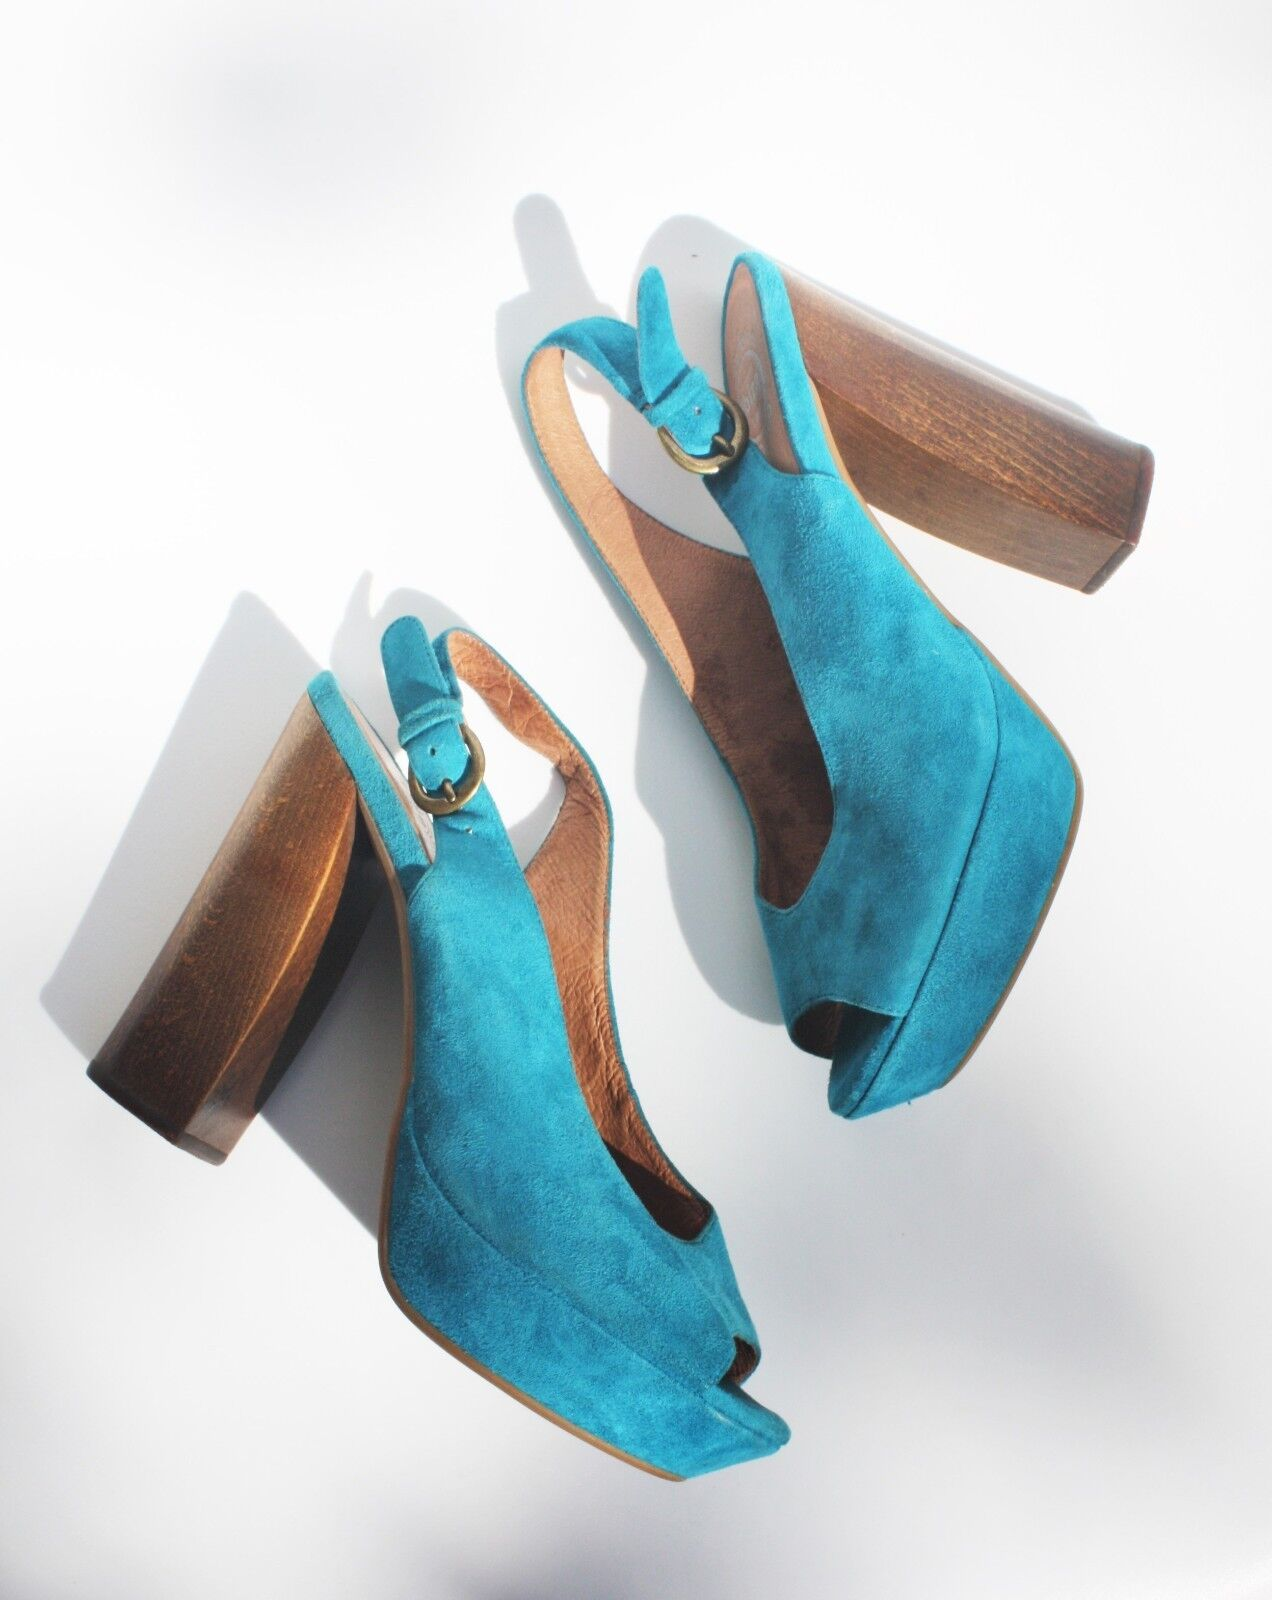 ordina adesso JEFFREY CAMPBELL FRIEND PLATFORMS 7 7 7 blu Suede scarpe Chunky Heels Peep Toe Pumps  consegna veloce